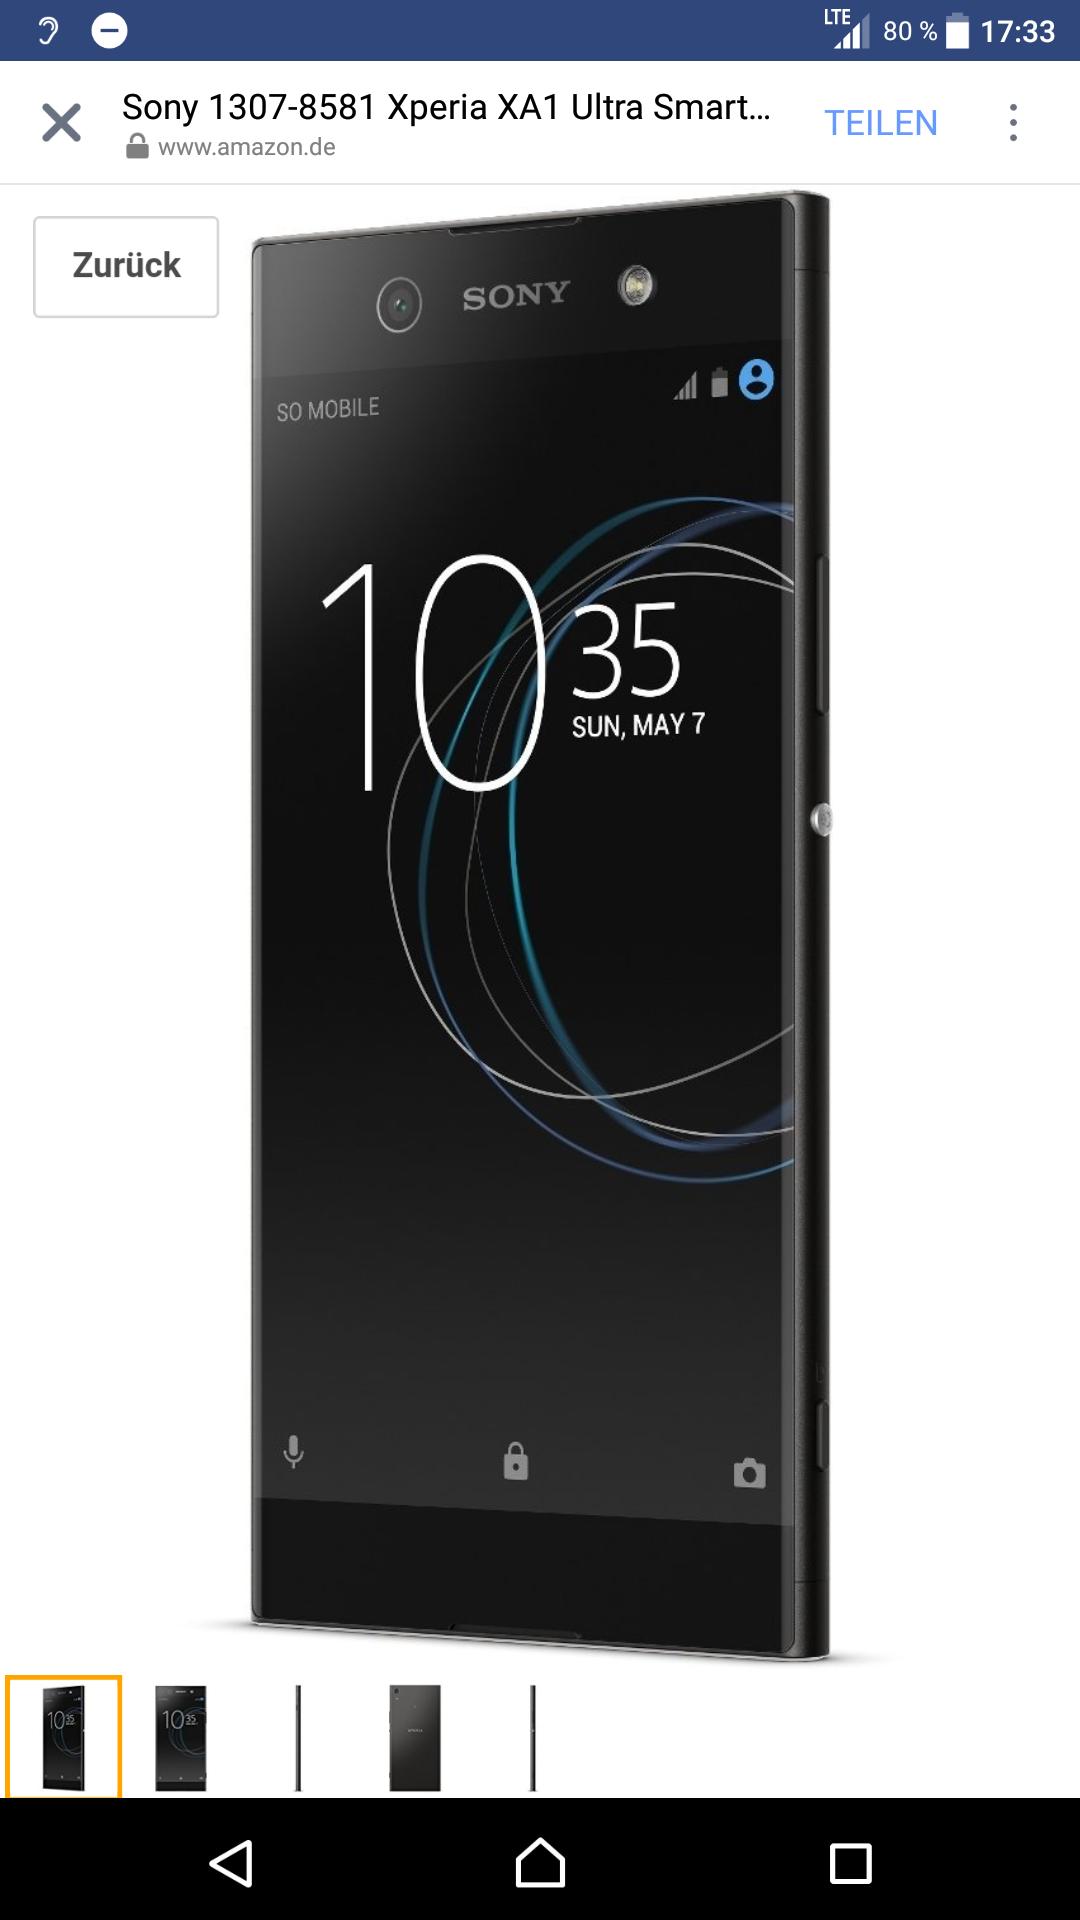 Sony Xperia XA1 Ultra  21% Günstiger [Blitzangebot]